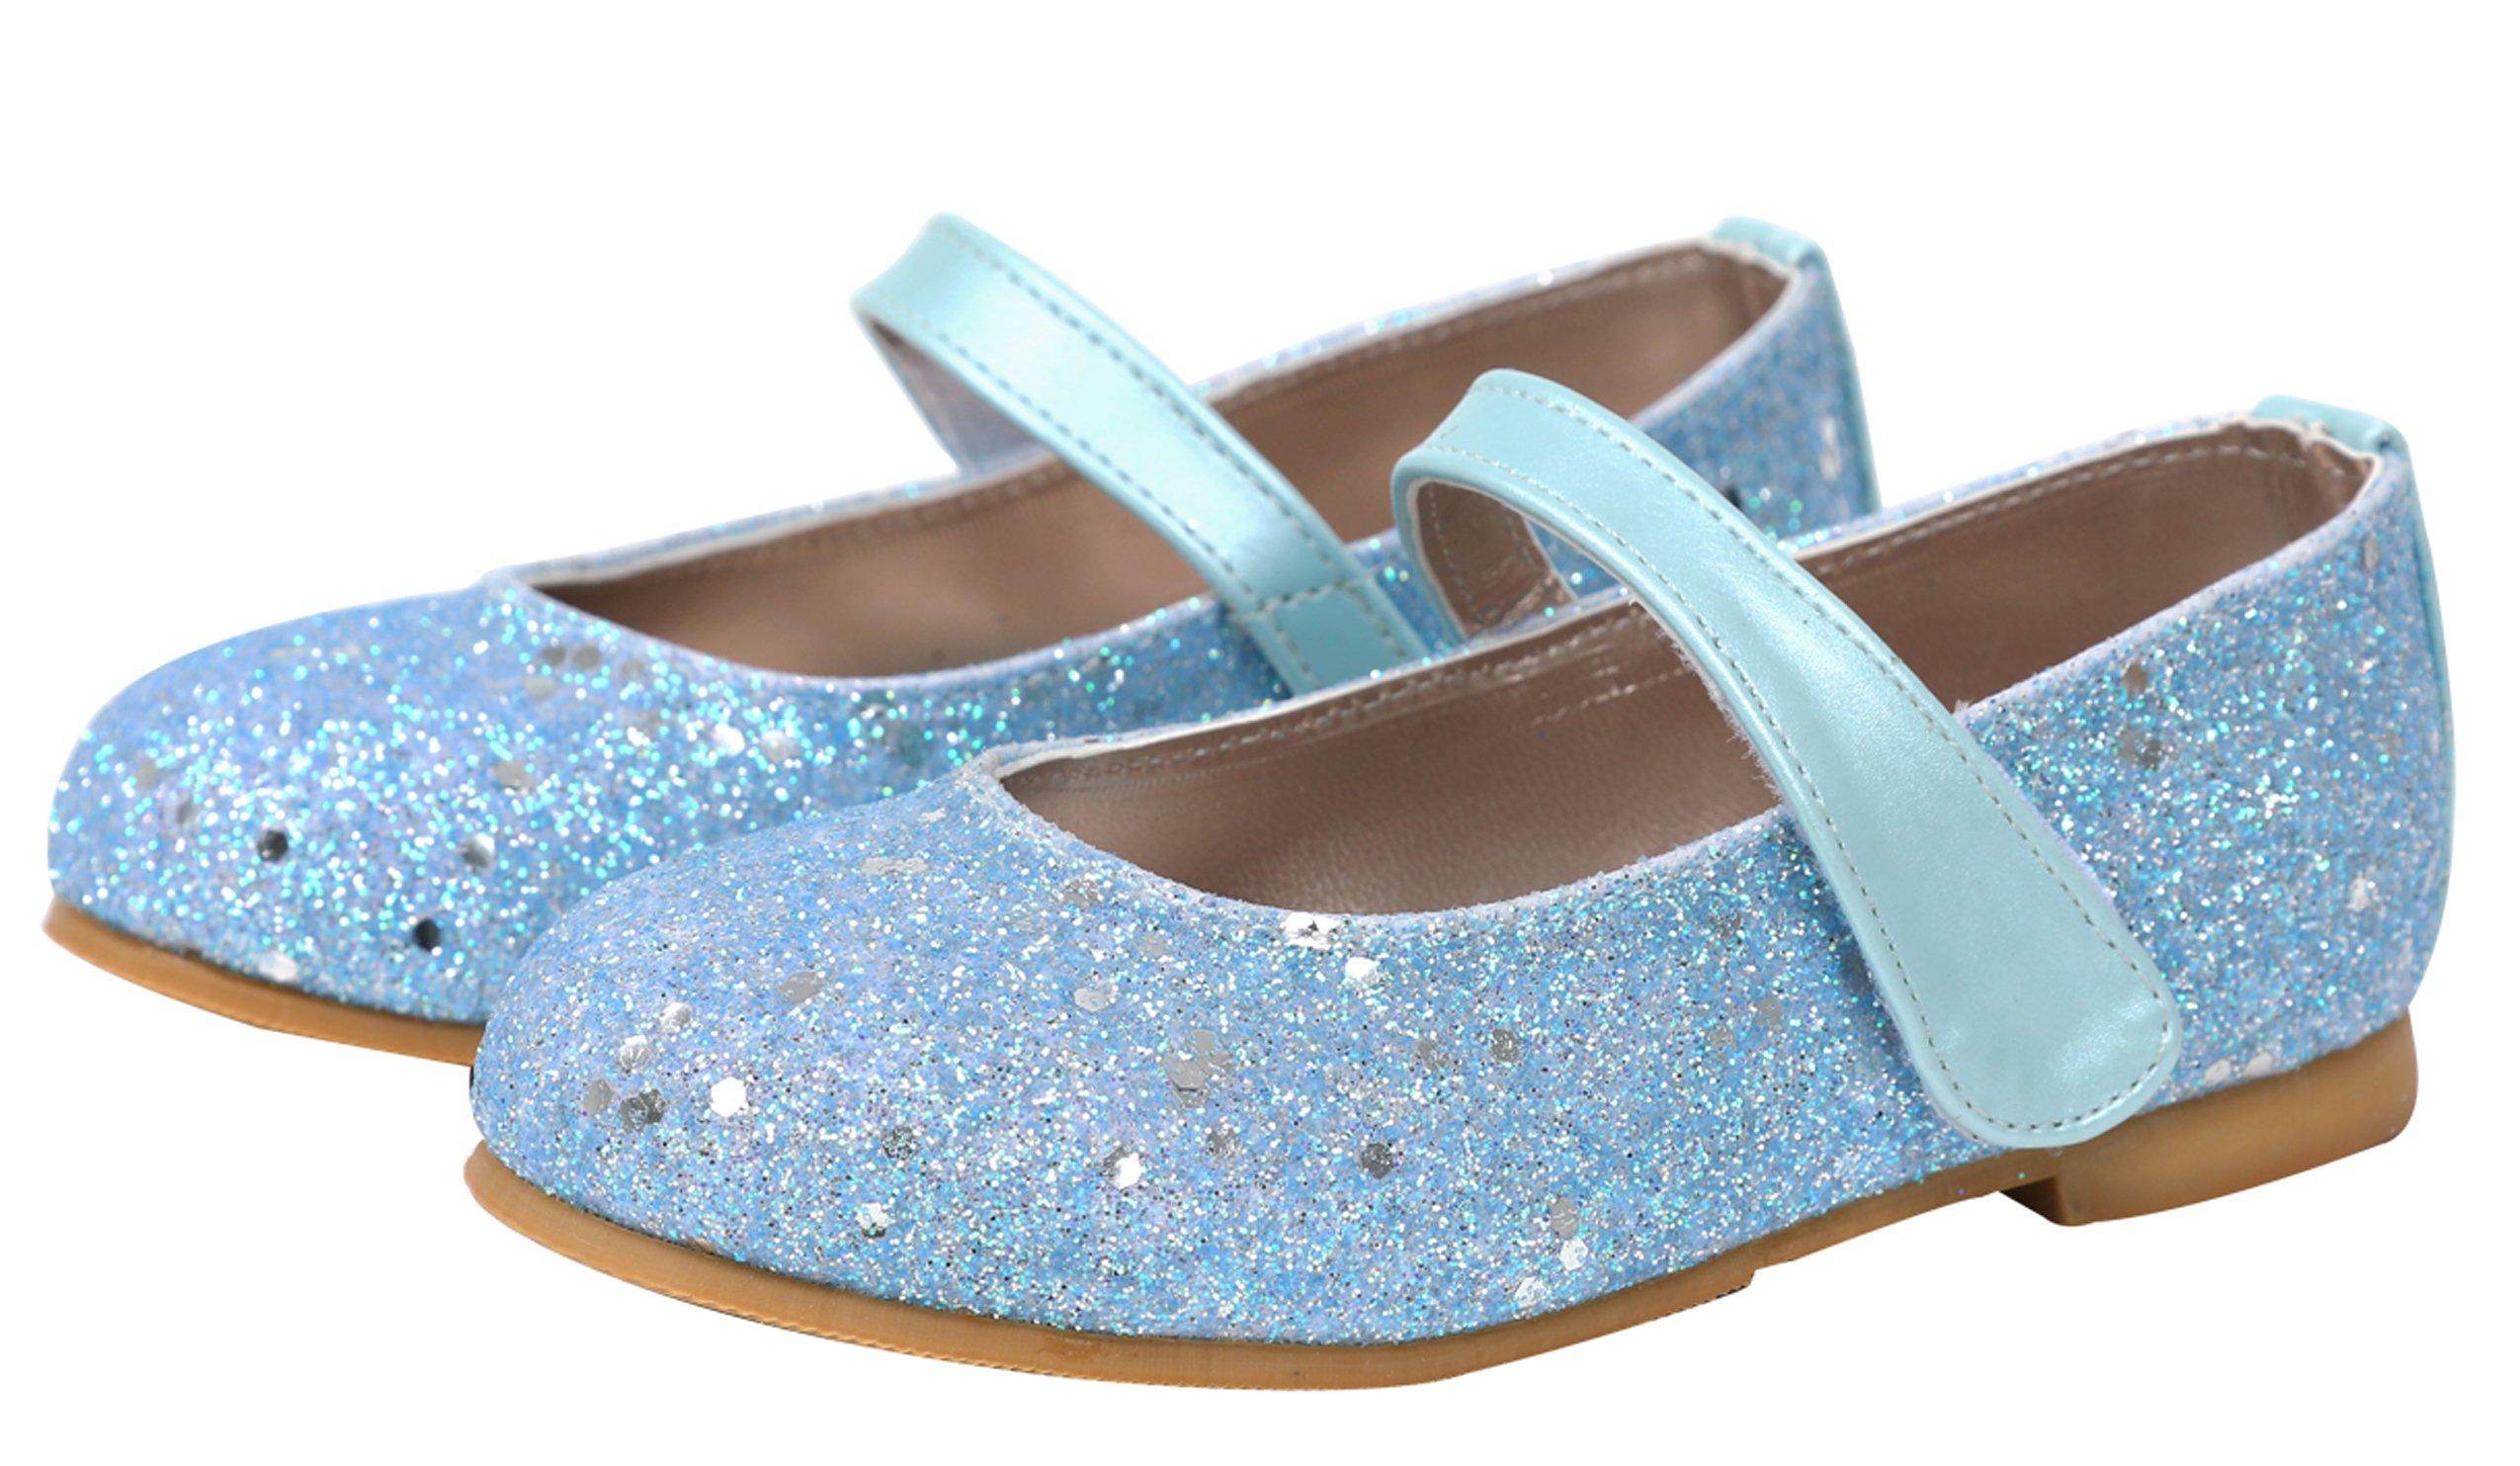 Ozkiz Little Girls Ballet Flats Princess Bridesmaid Wedding Party School Mary Janes Shoes Sky 10M